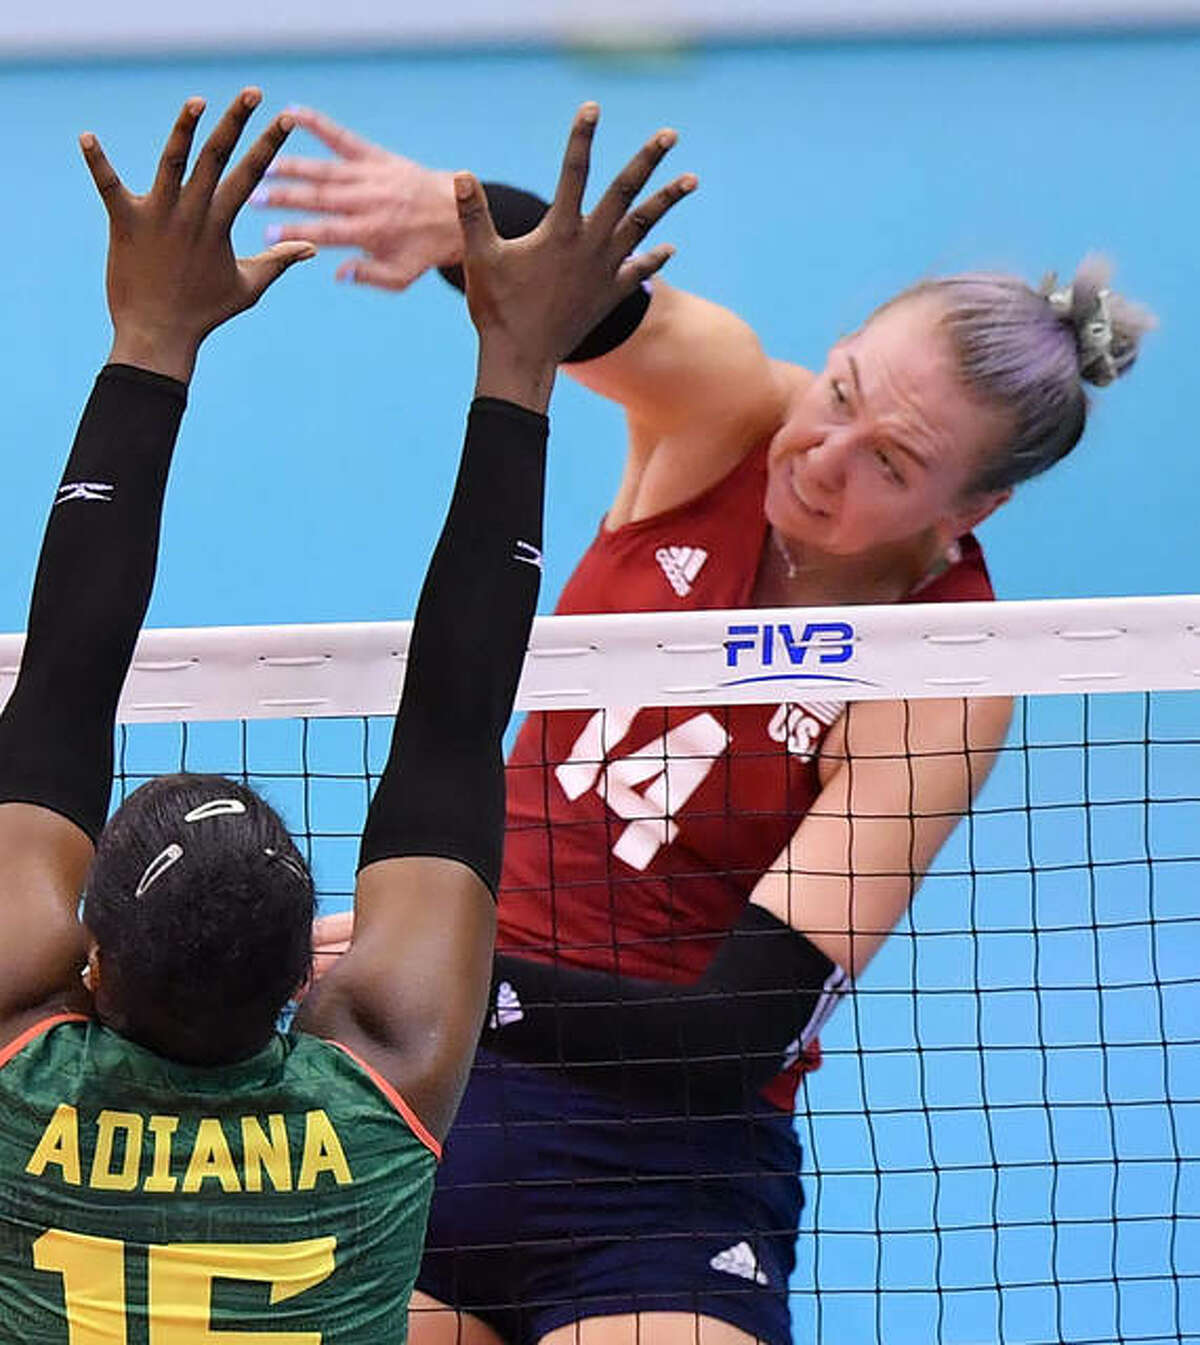 Michelle Bartsch-Hackley in action for Team USA. Bartsch-Hackley is a Collinsville High School graduate.